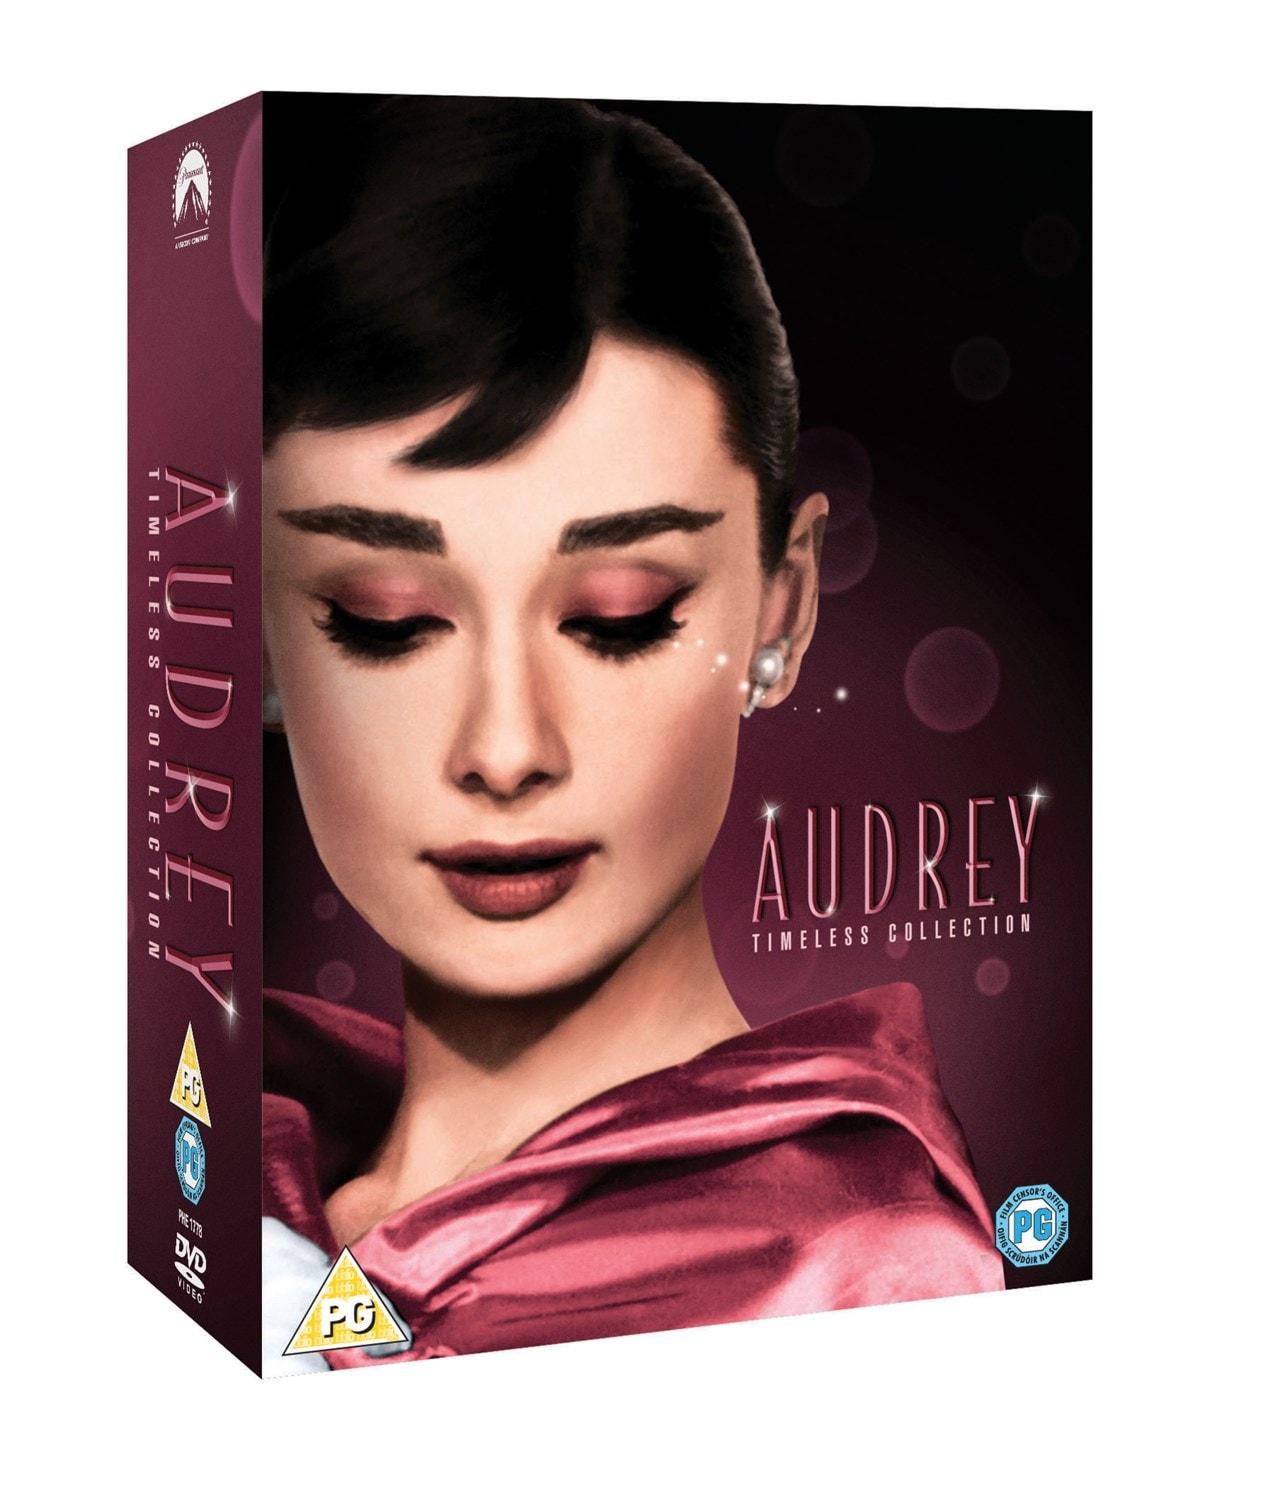 Audrey Hepburn Timeless Collection - 2